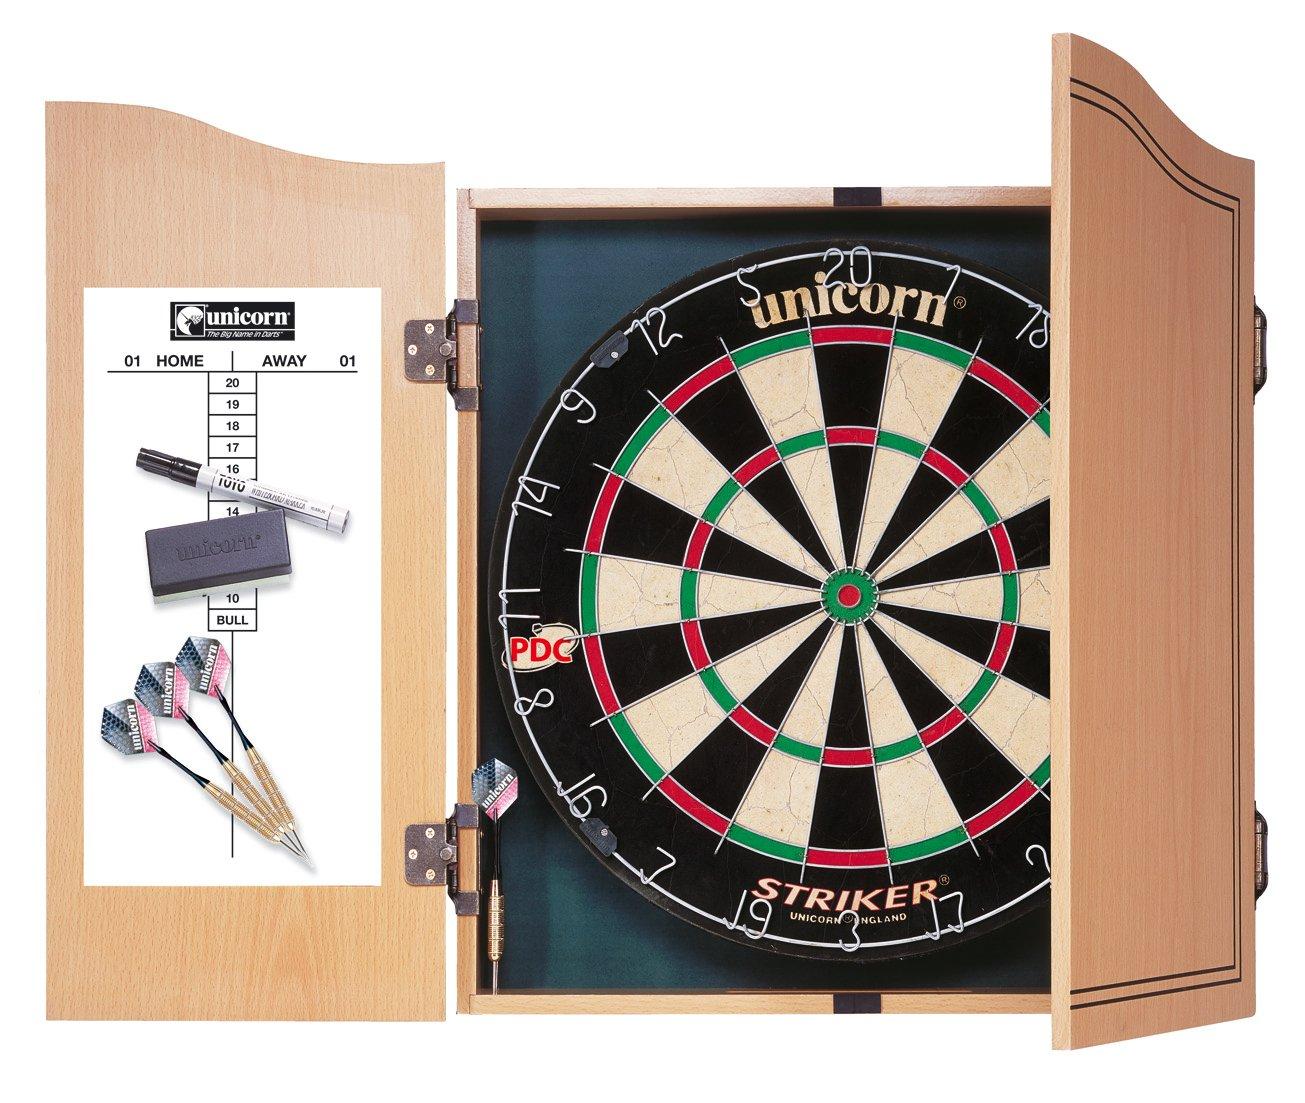 Unicorn Striker Home Darts Centre including Dartboard and Cabinet Unicorn Dartboard 46136